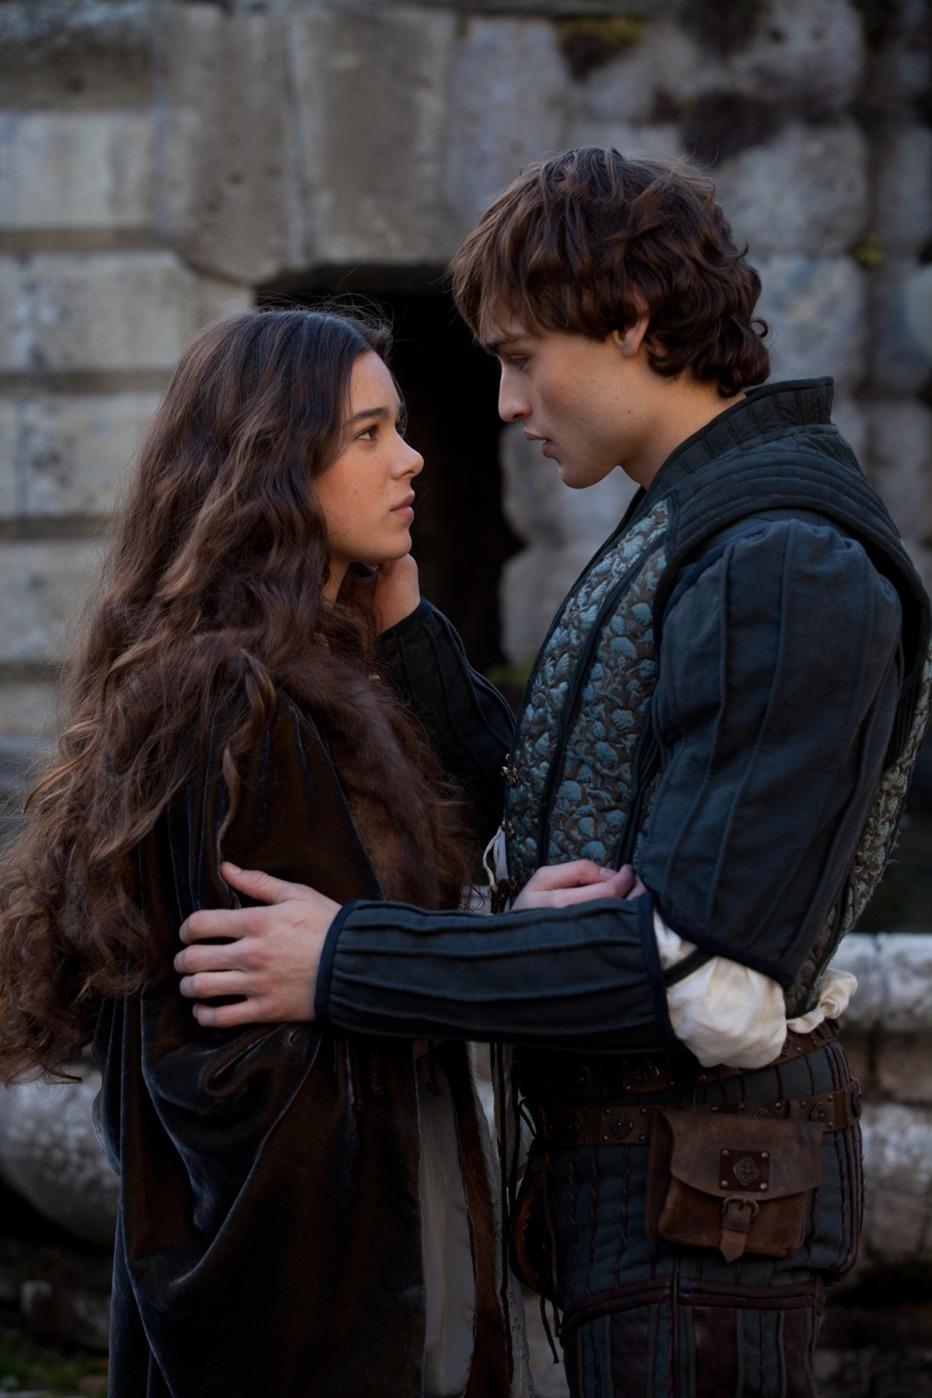 Romeo-Juliet-2013-Carlo-Carlei-31.jpg